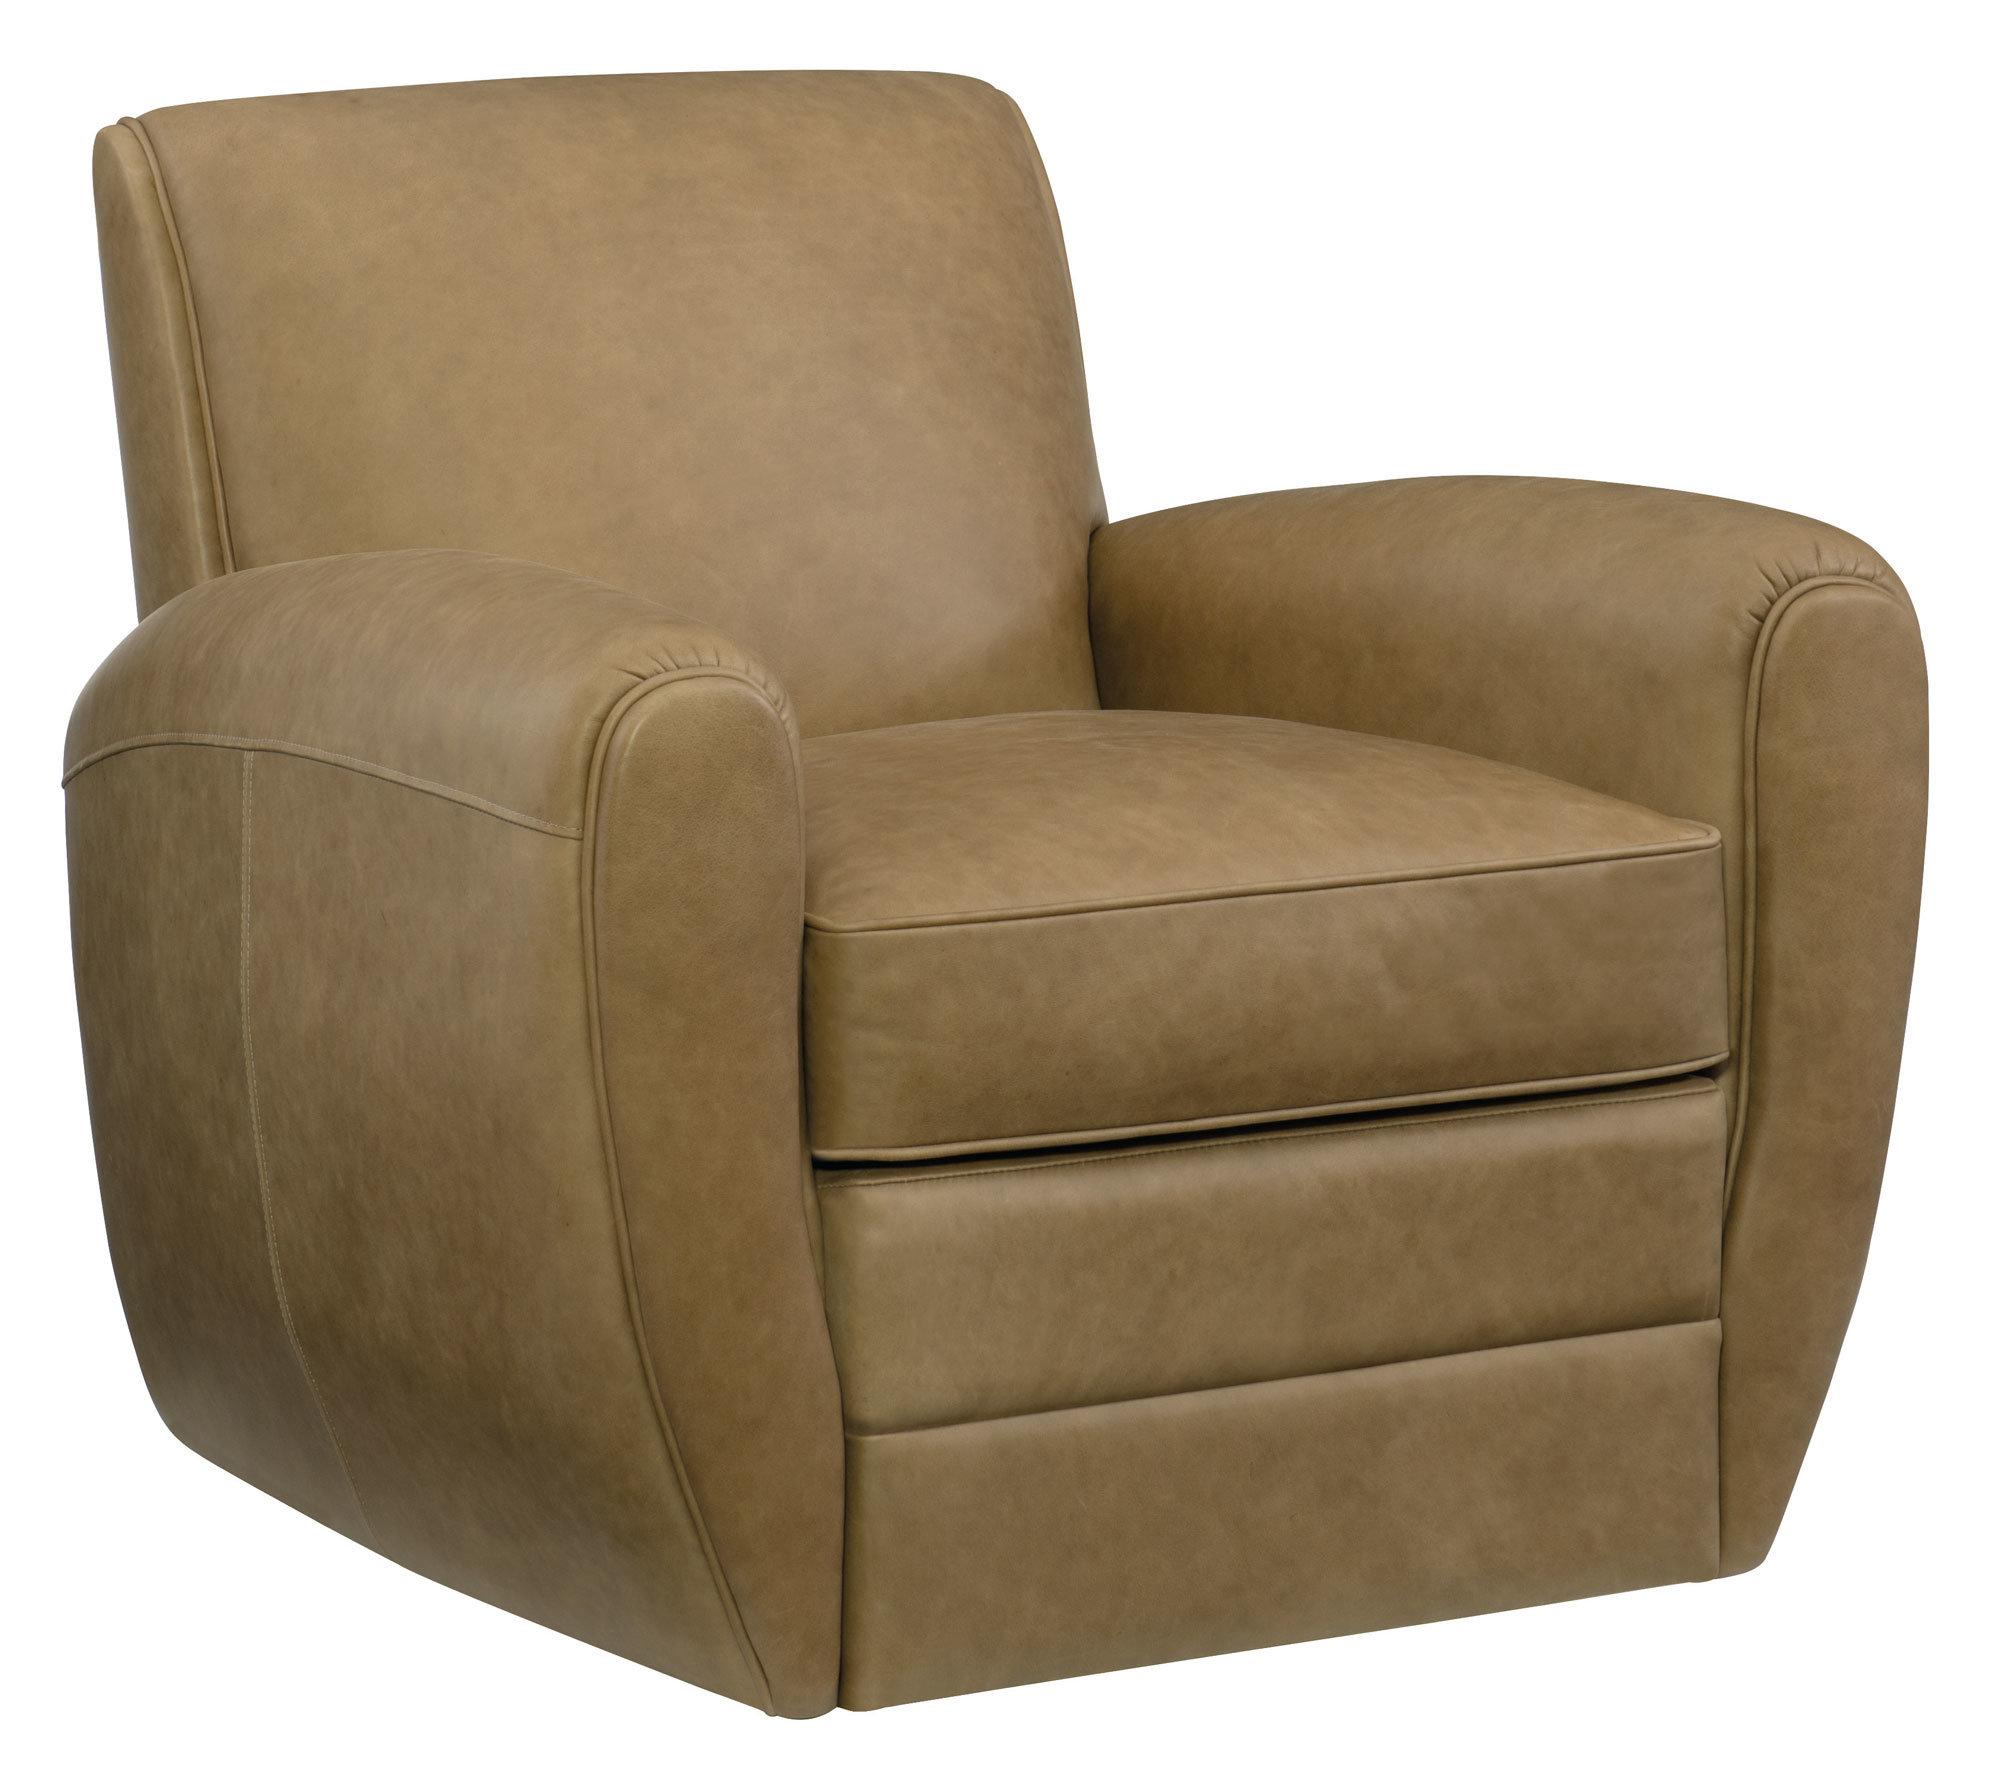 Bernhardt Versailles Swivel Club Chair | Wayfair Pertaining To Sadie Ii Swivel Accent Chairs (View 25 of 25)